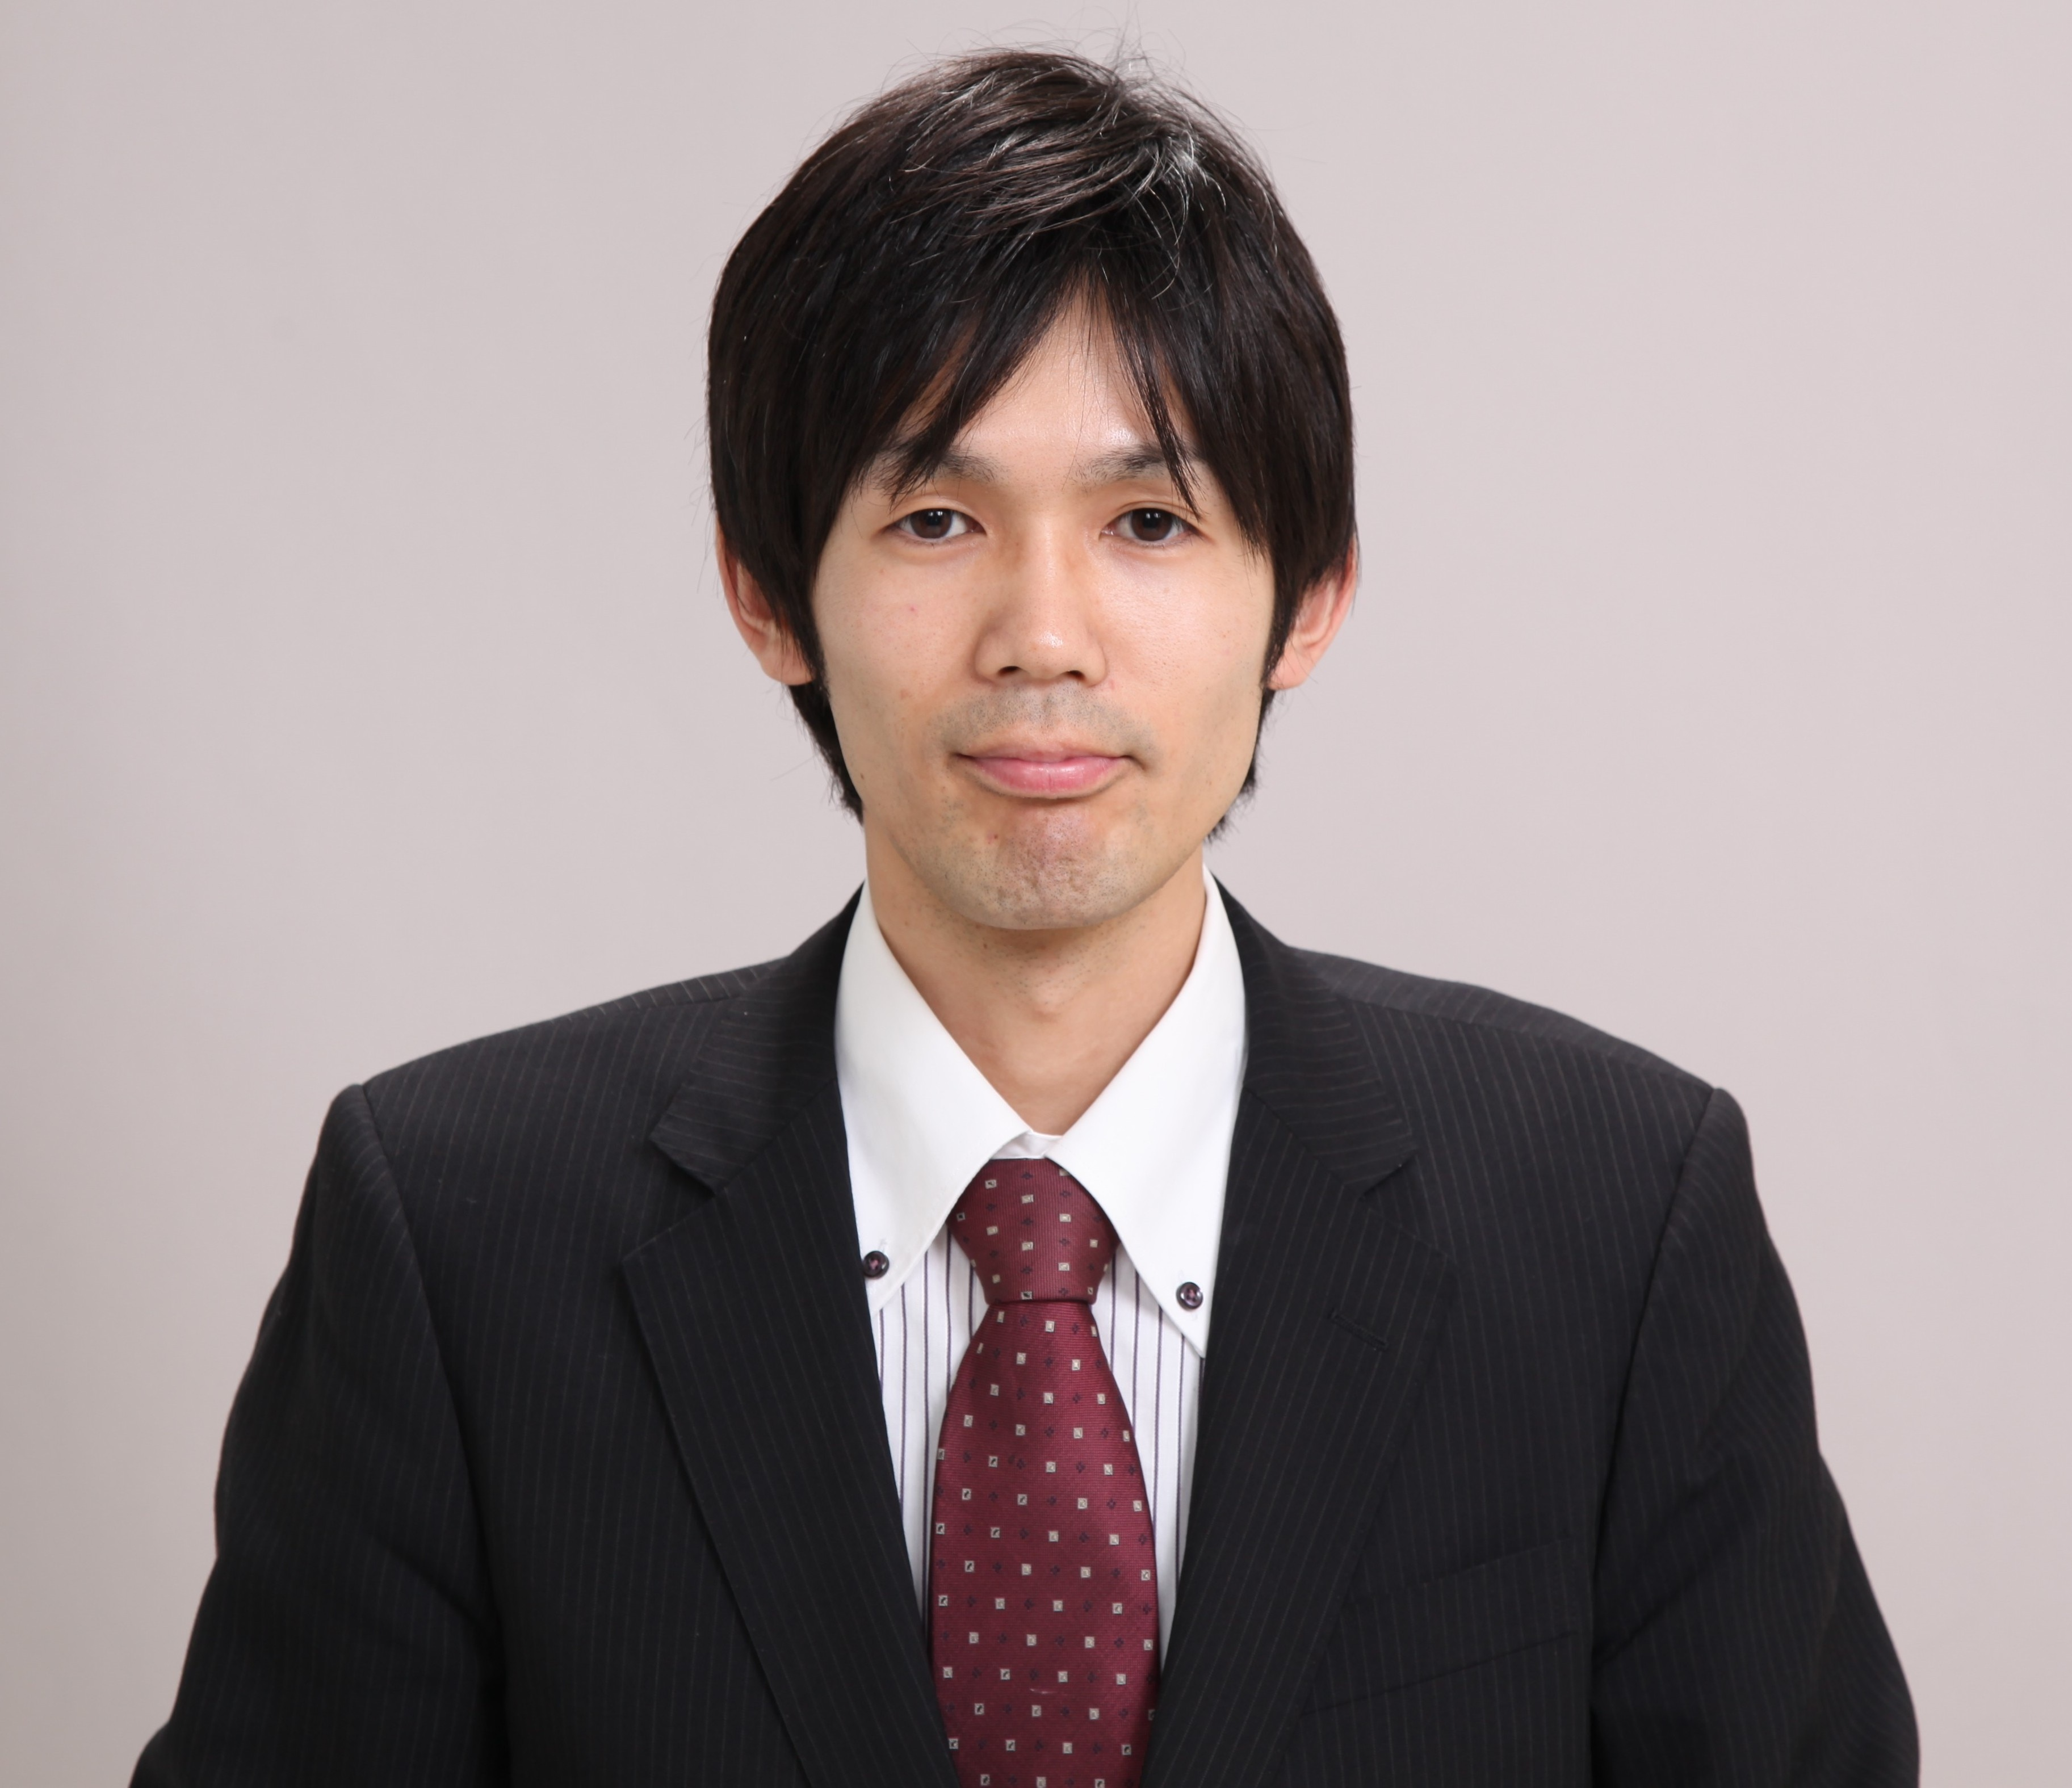 株式会社ナニワ商会 大島